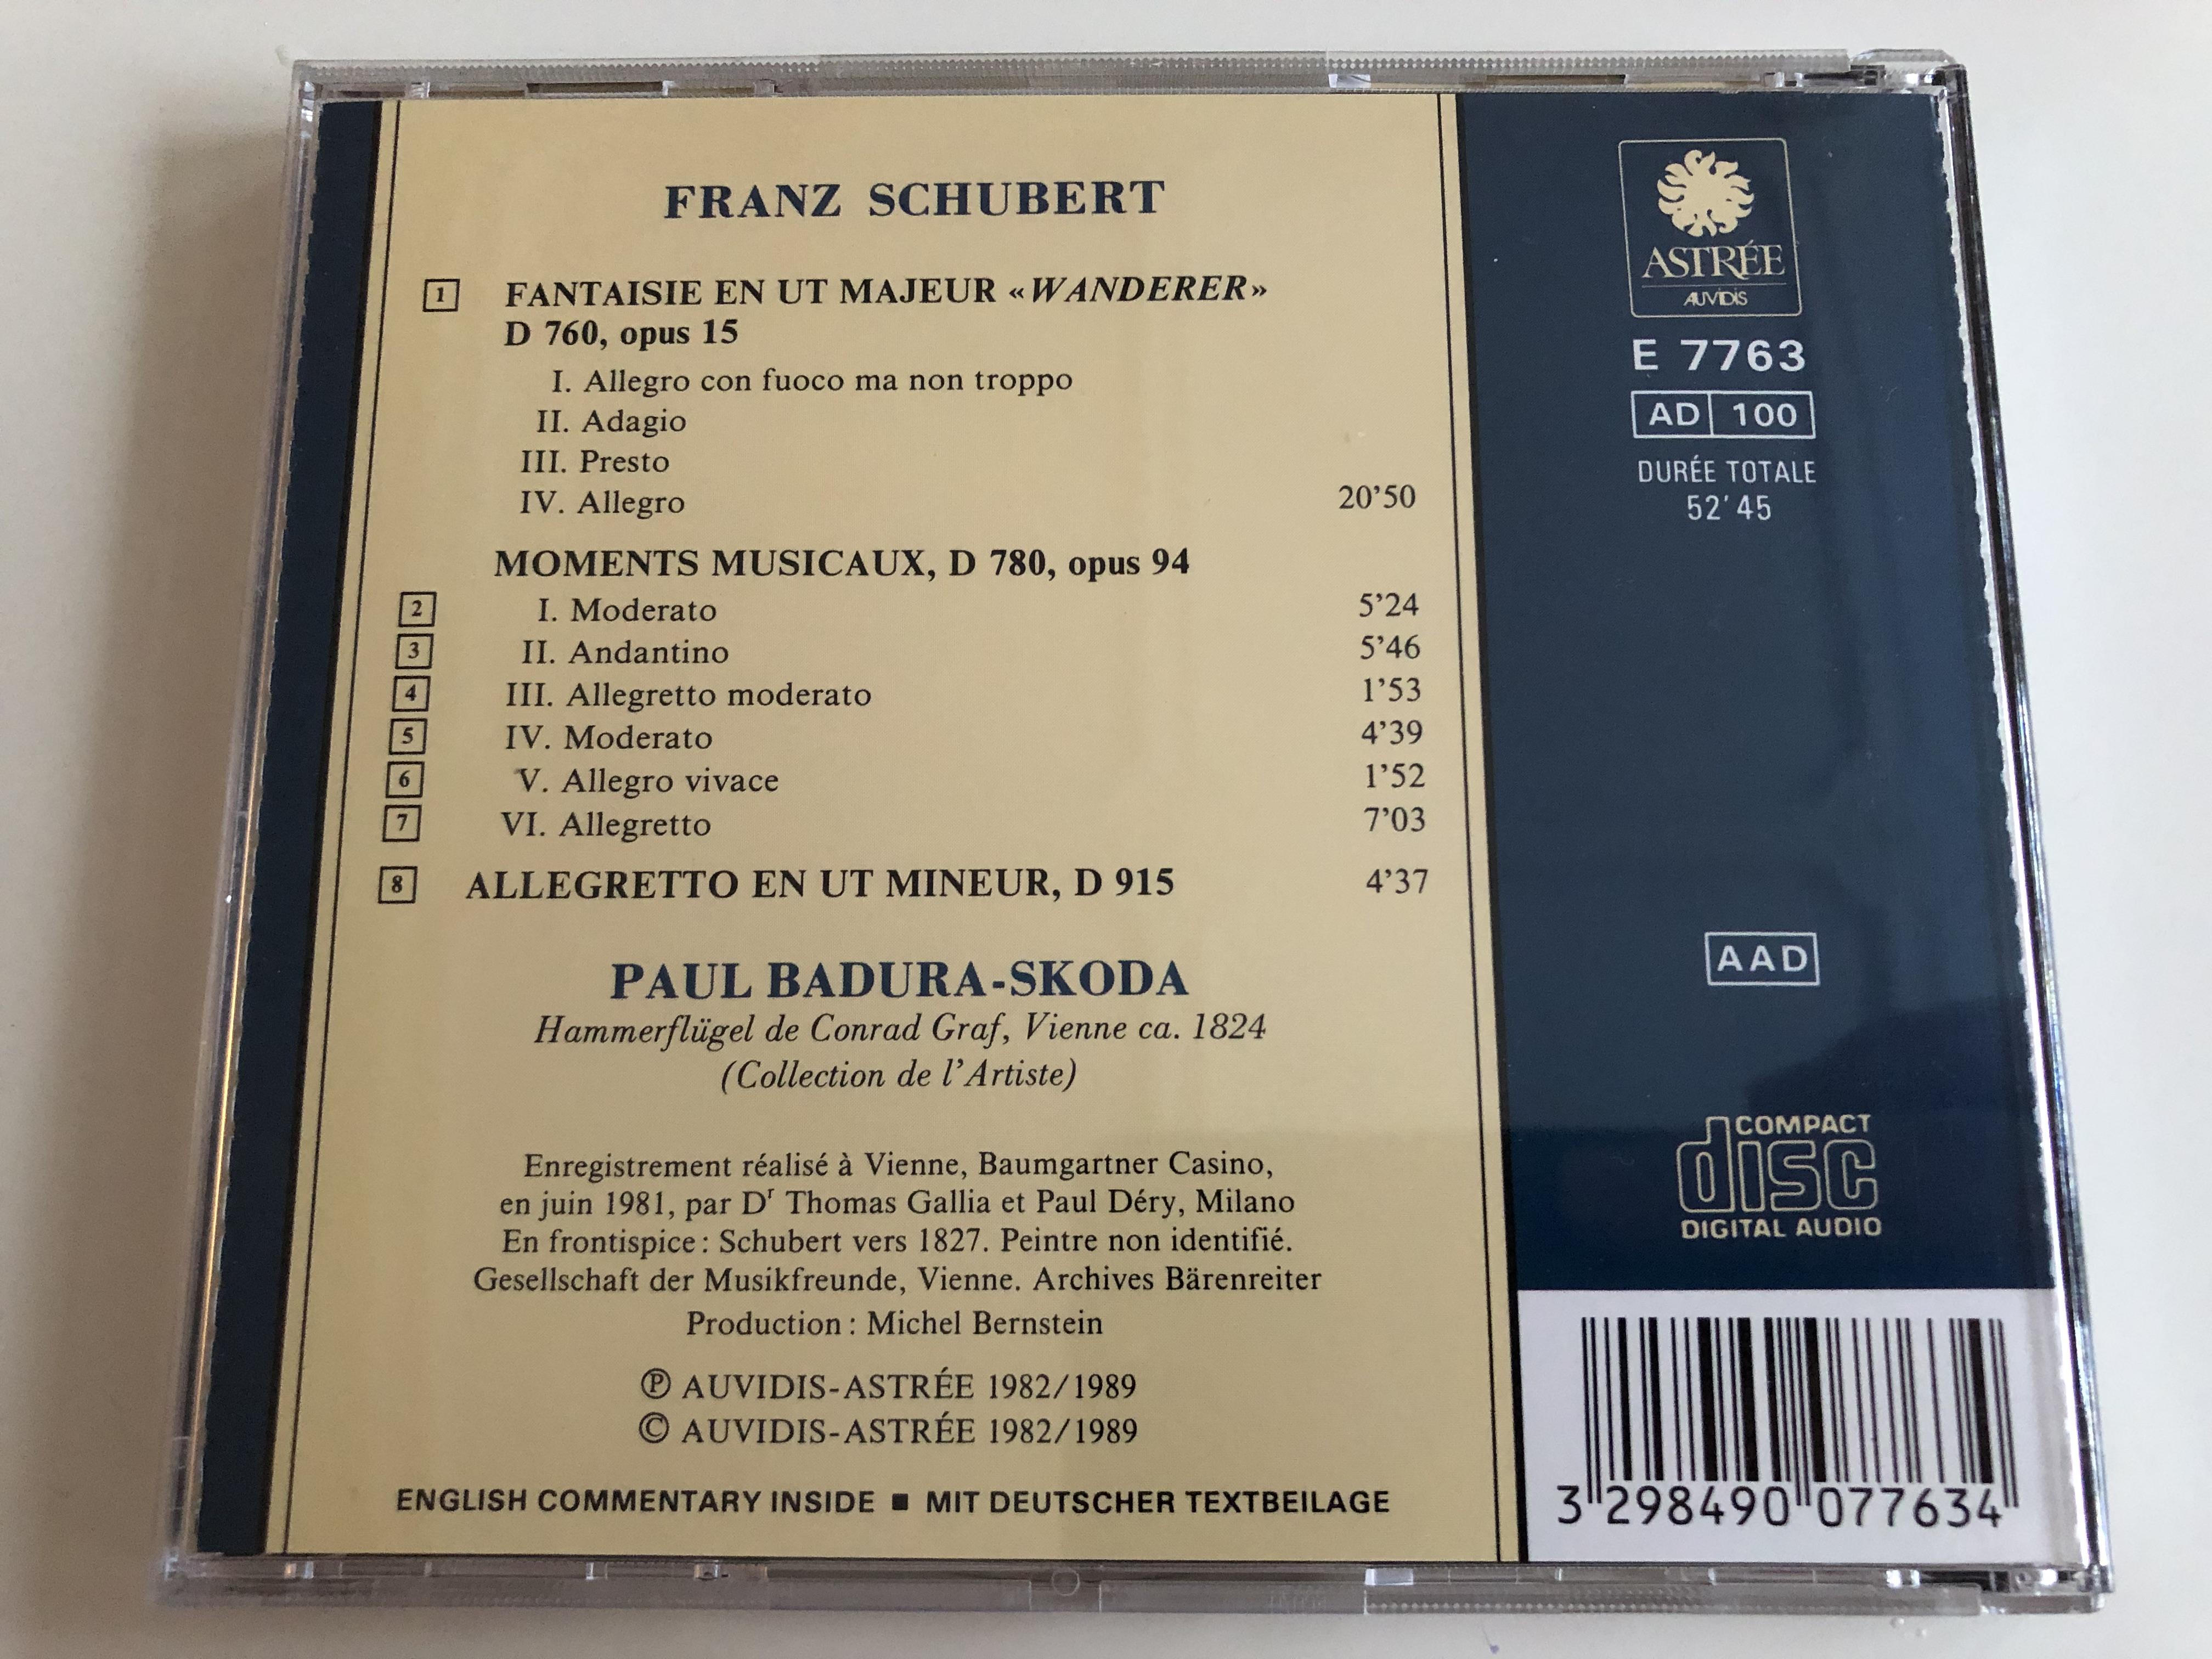 franz-schubert-fantaisie-pour-le-piano-forte-euvre-15-wanderer-fantasie-moments-musicaux-euvre-94-paul-badura-skoda-hammerfl-gel-conrad-graf-vienna-ca.-1824-audio-cd-e7763-auvidis-4-.jpg